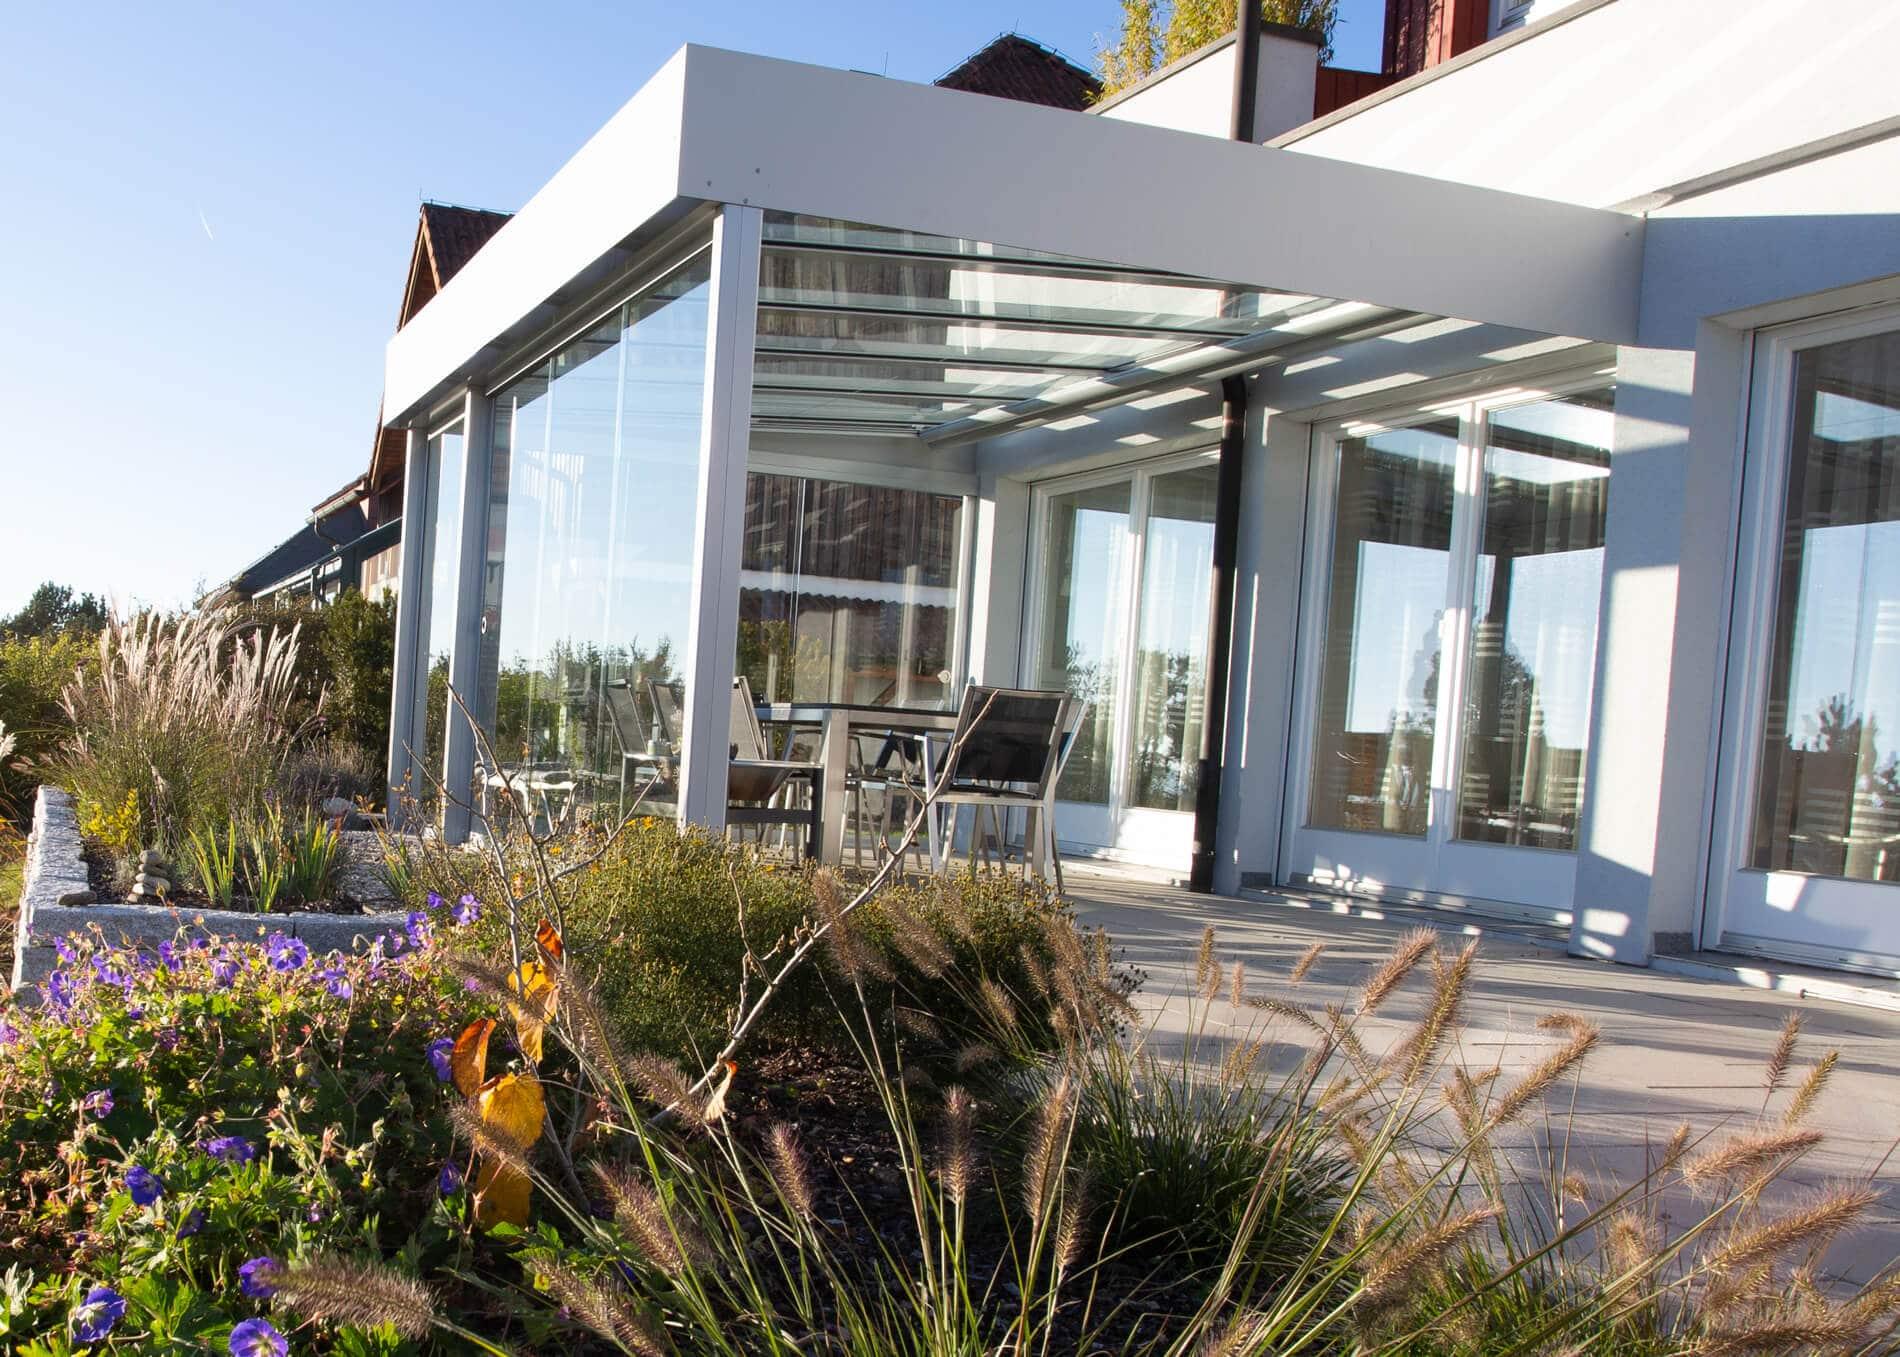 wintergarten unterhalb balkon fenster schmidinger. Black Bedroom Furniture Sets. Home Design Ideas